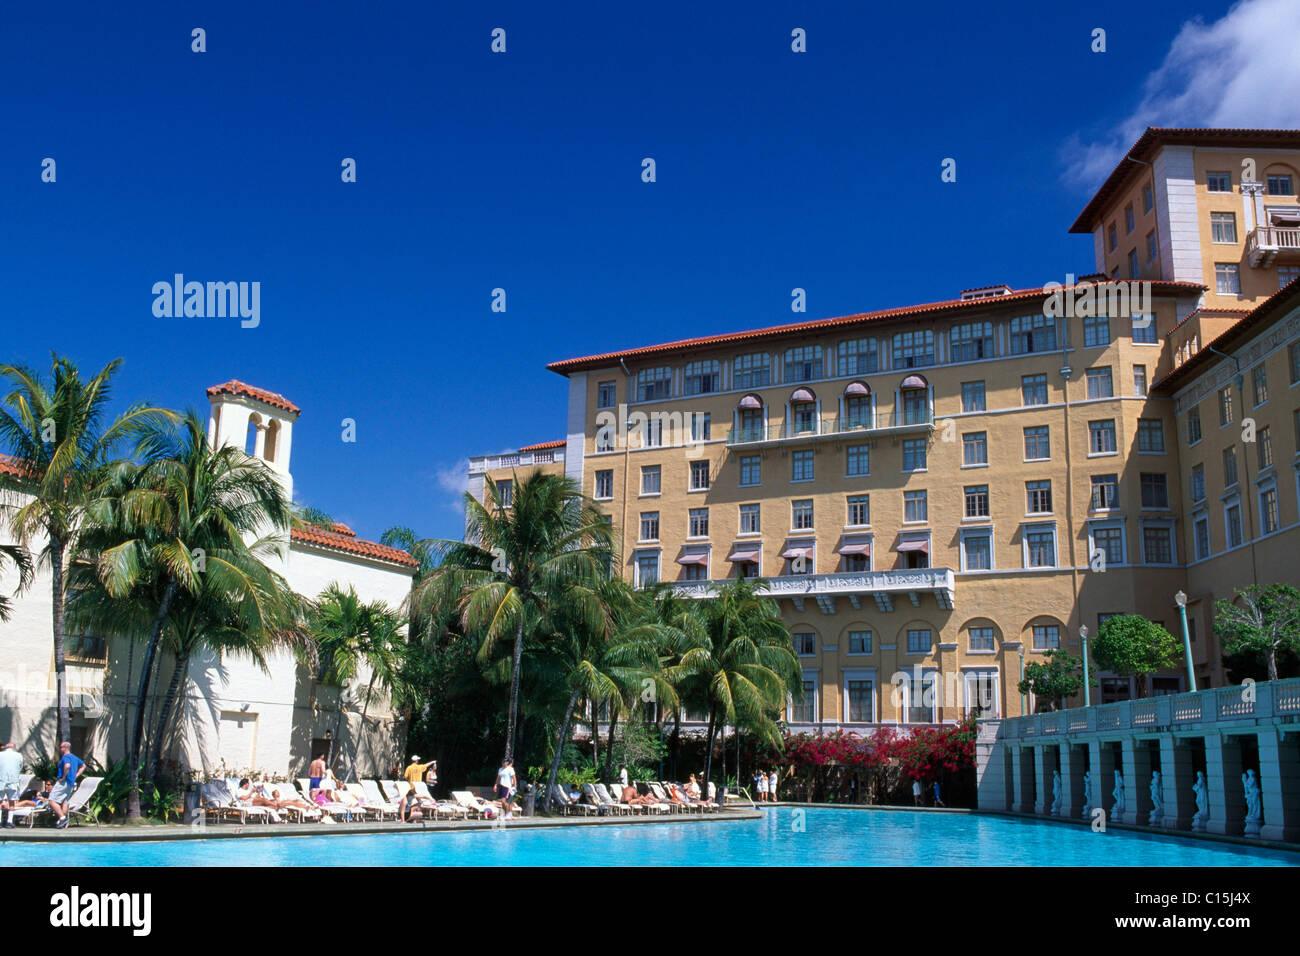 Biltmore Hotel swimming pool, Coral Gables, Miami, Florida, USA - Stock Image